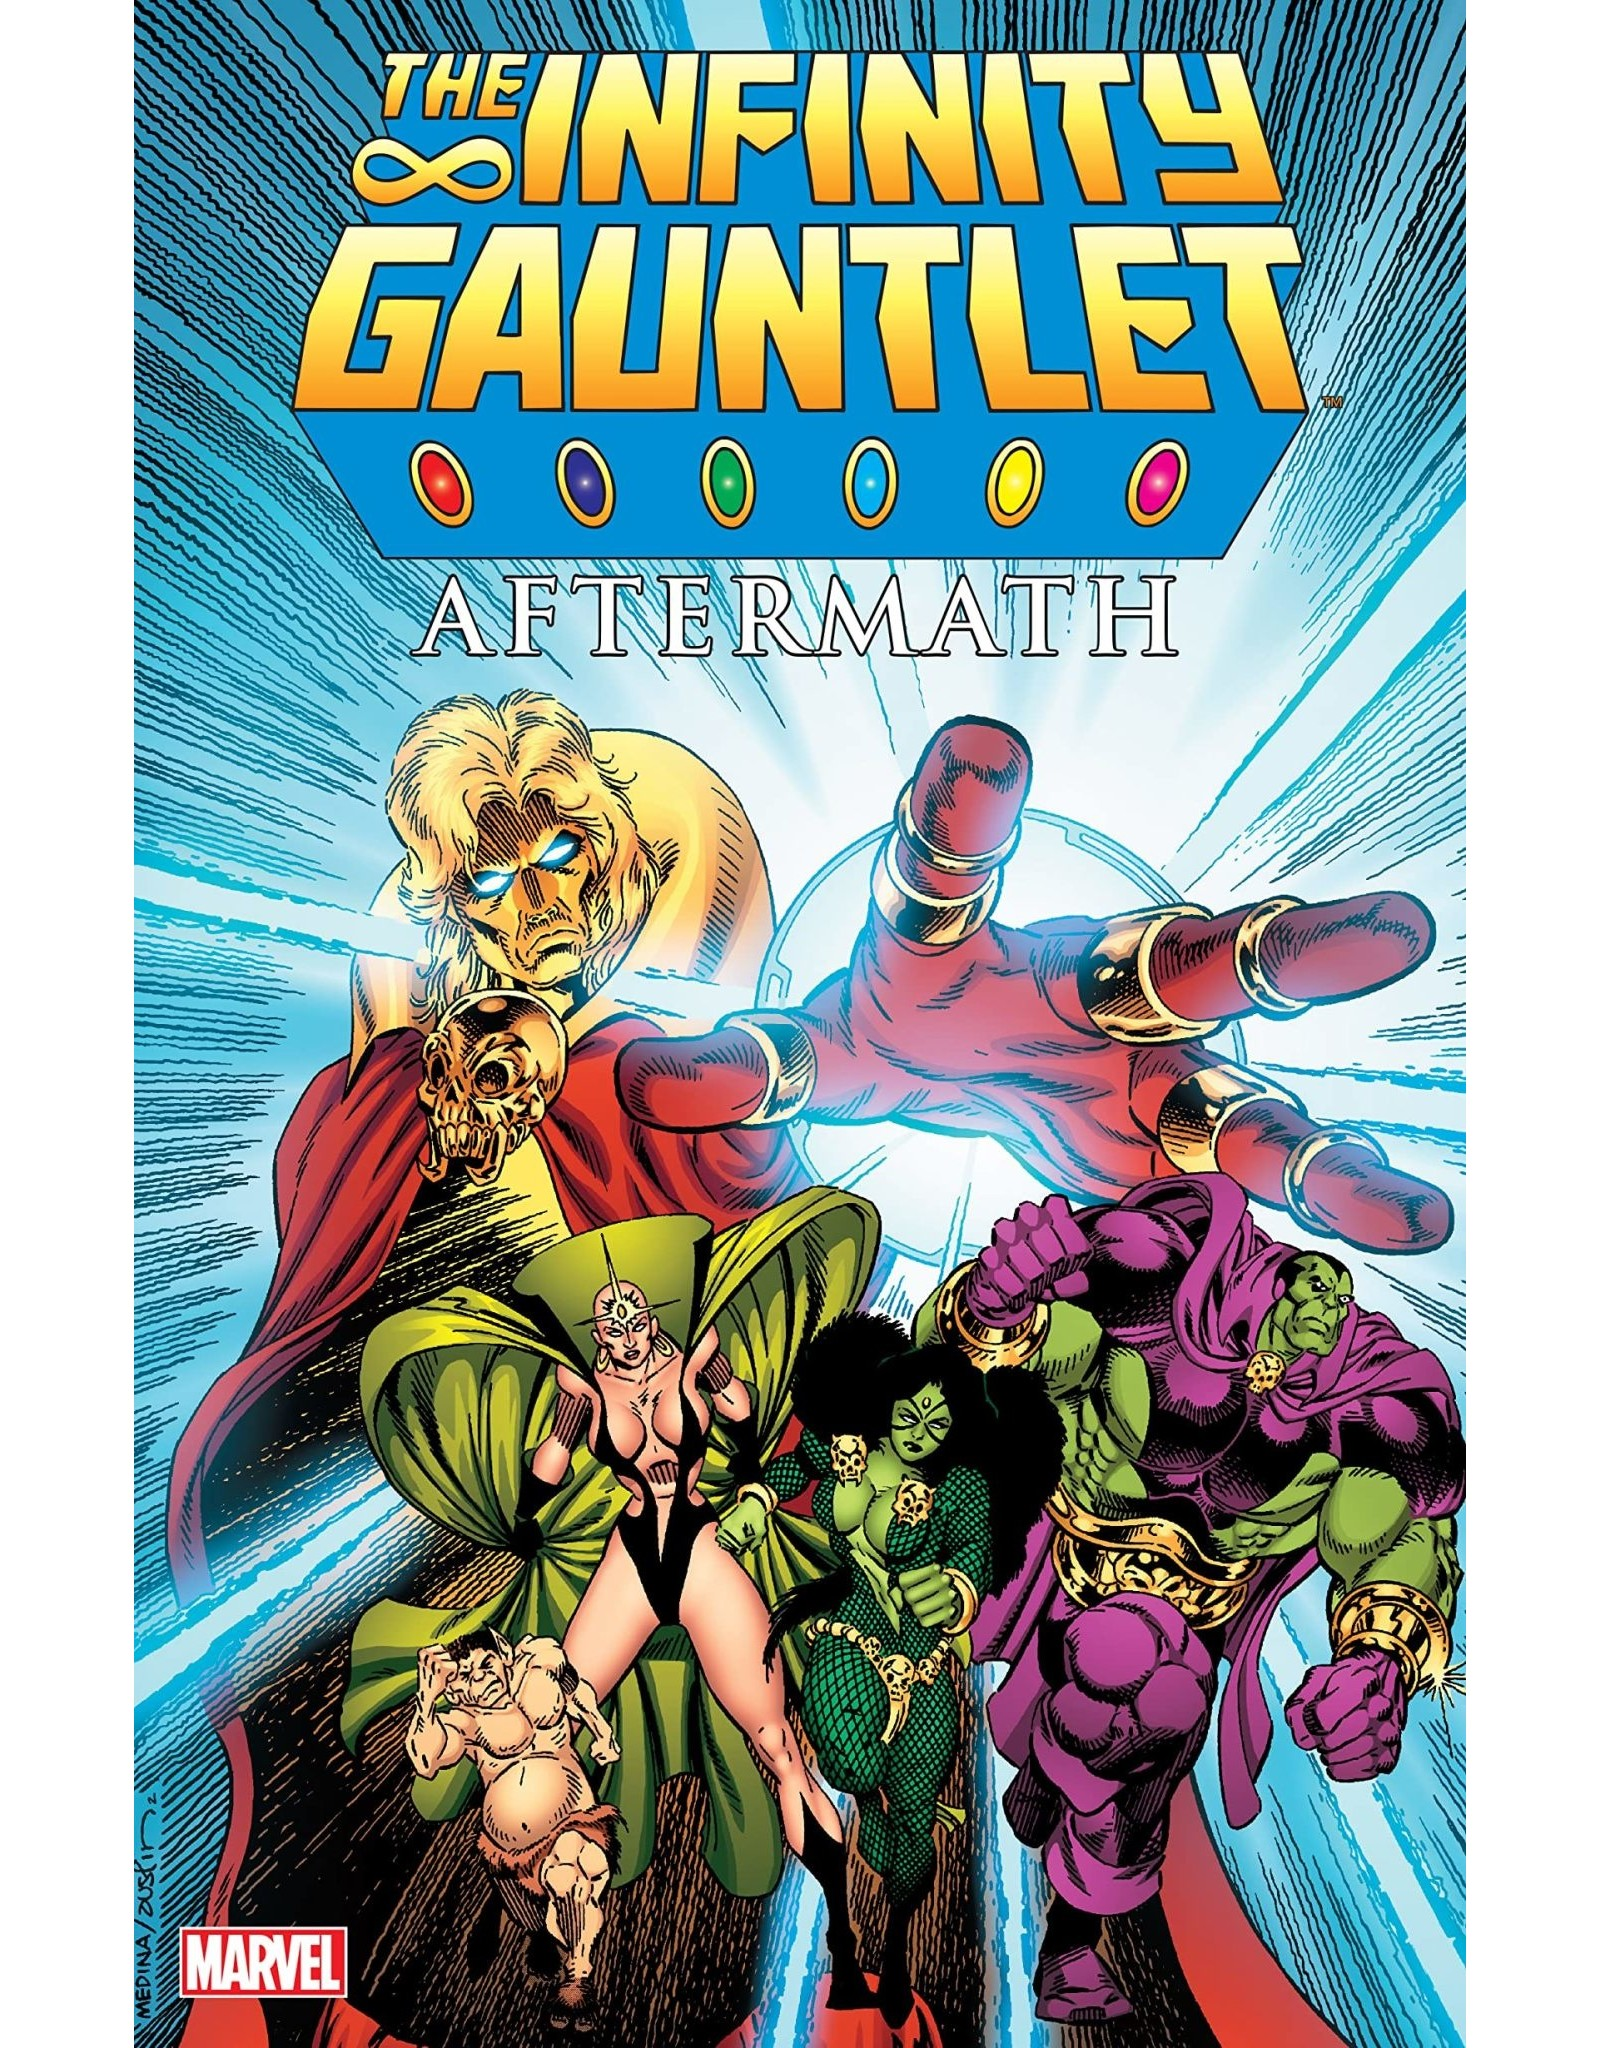 MARVEL COMICS INFINITY GAUNTLET AFTERMATH TRADE PAPERBACK